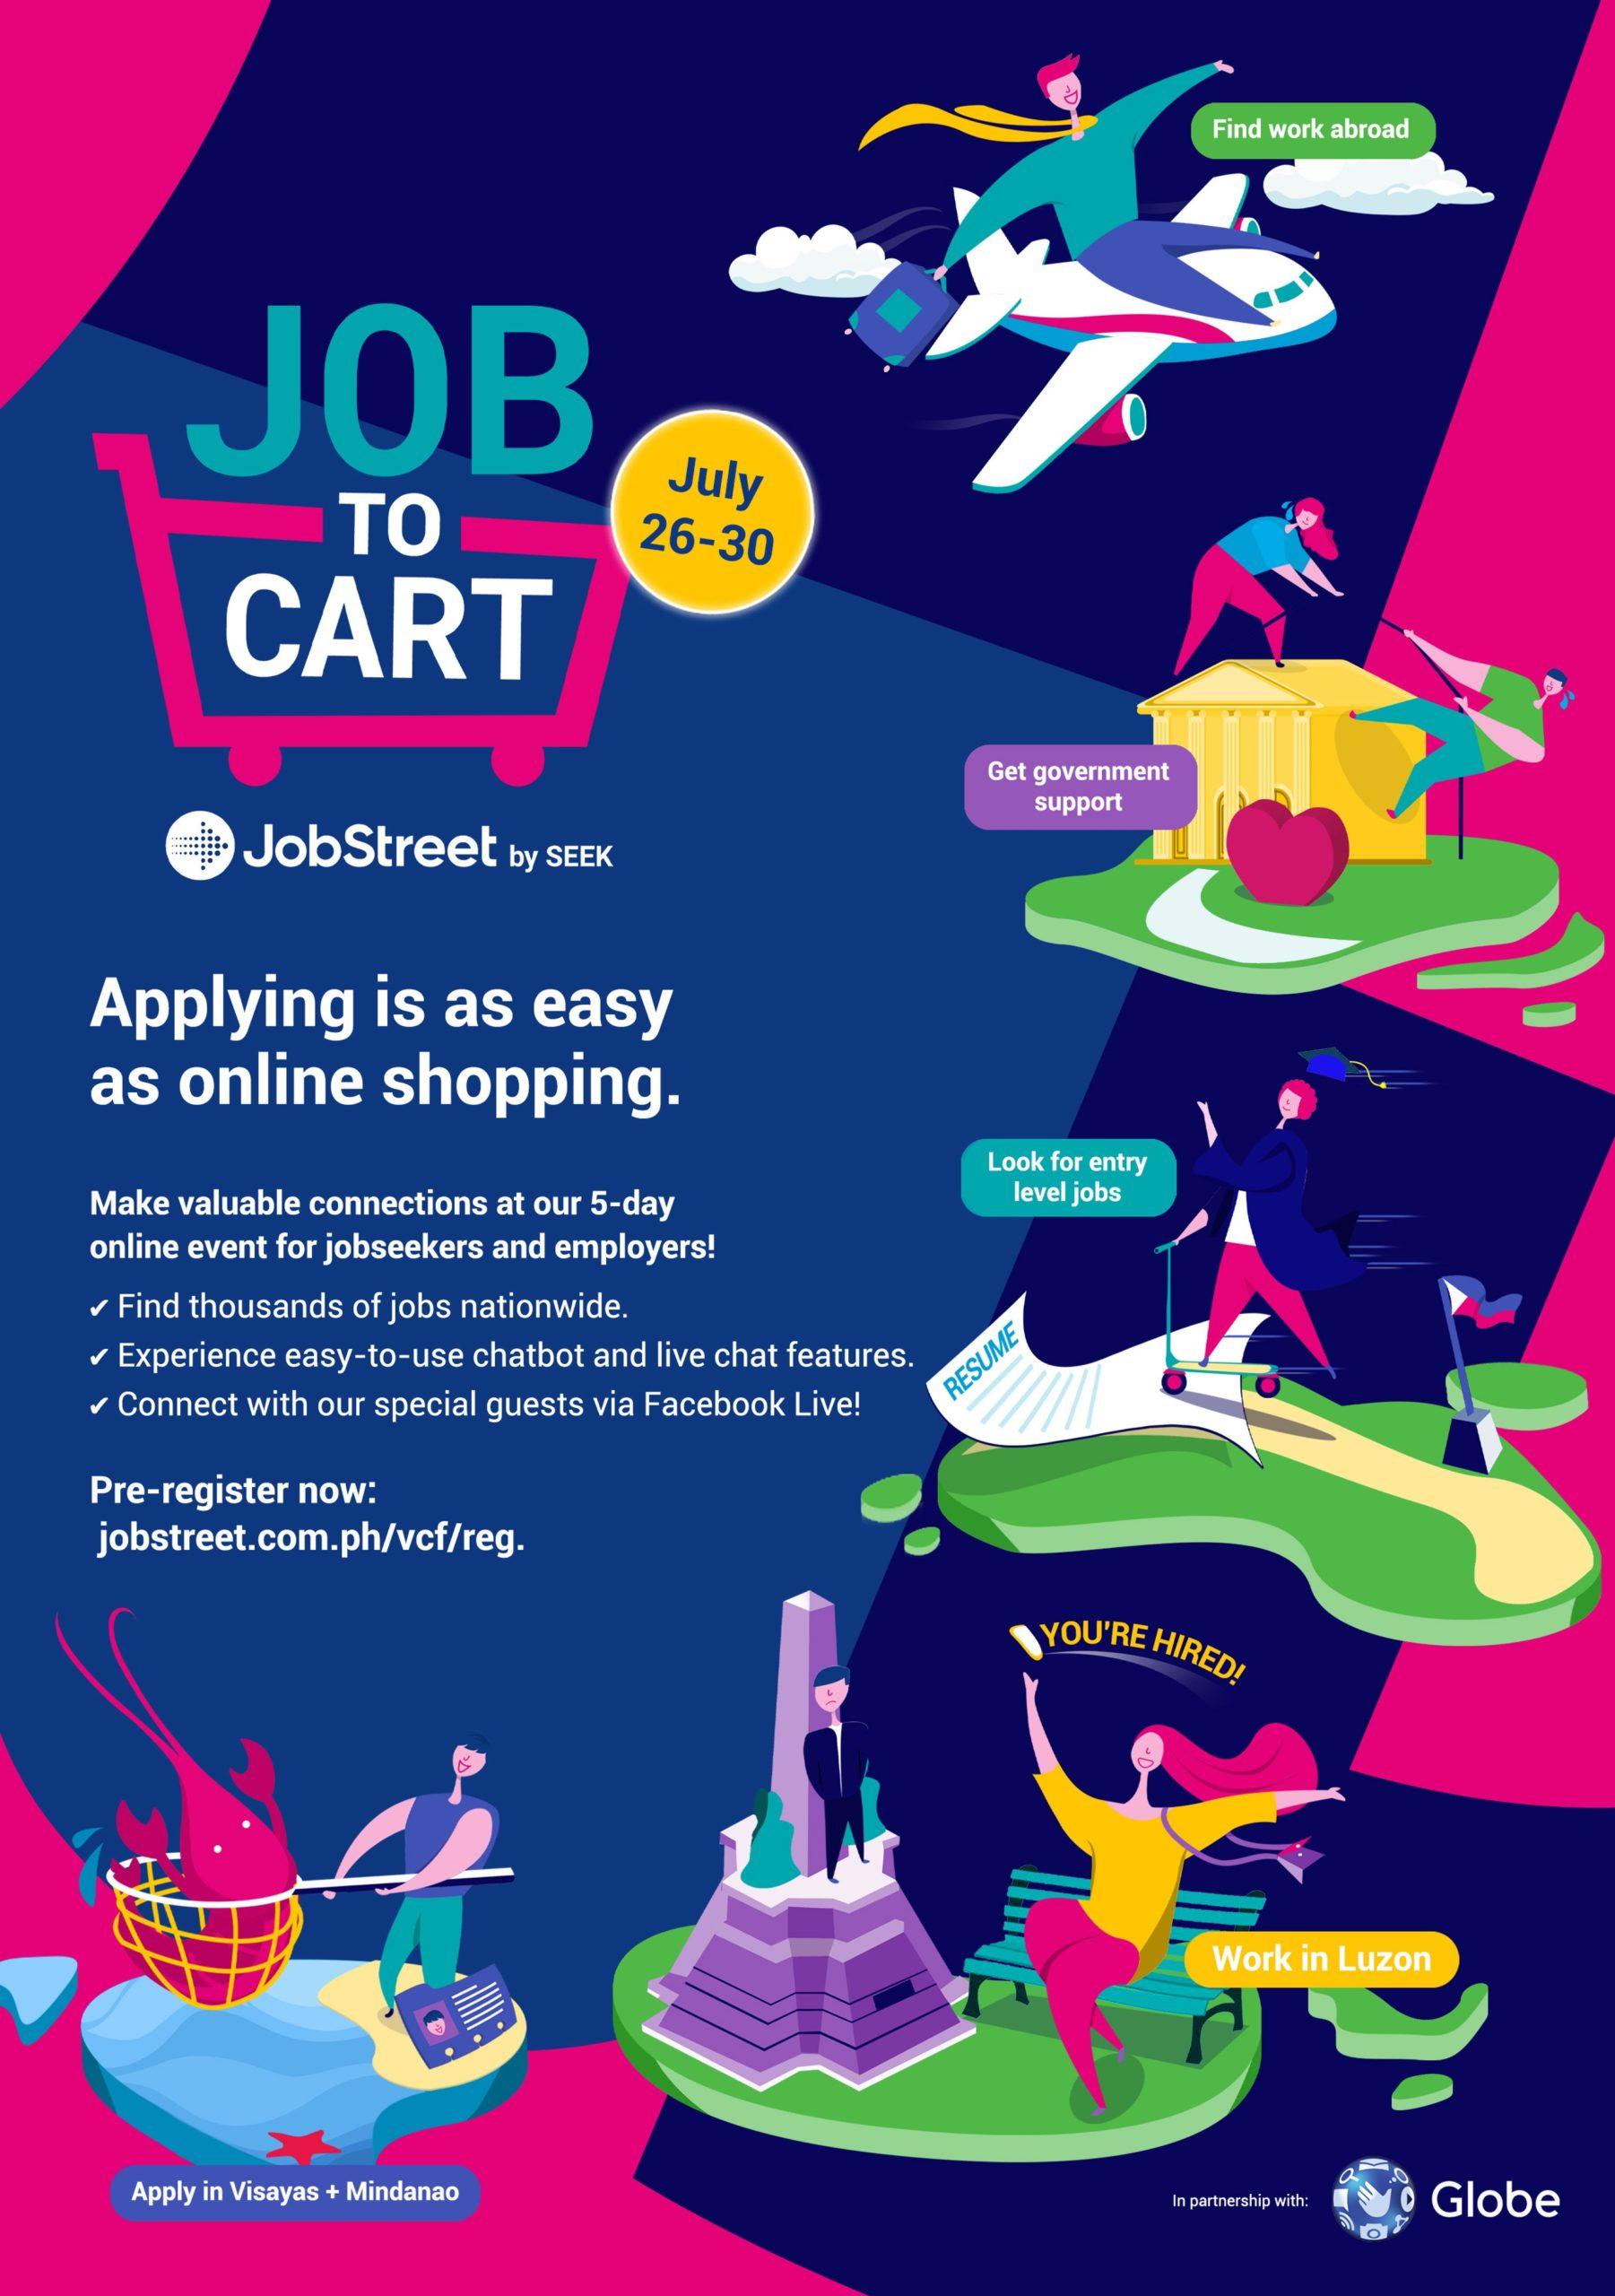 ComCo SOutheast Asia - New PR Smart Social - Job to Cart - Jobstreet